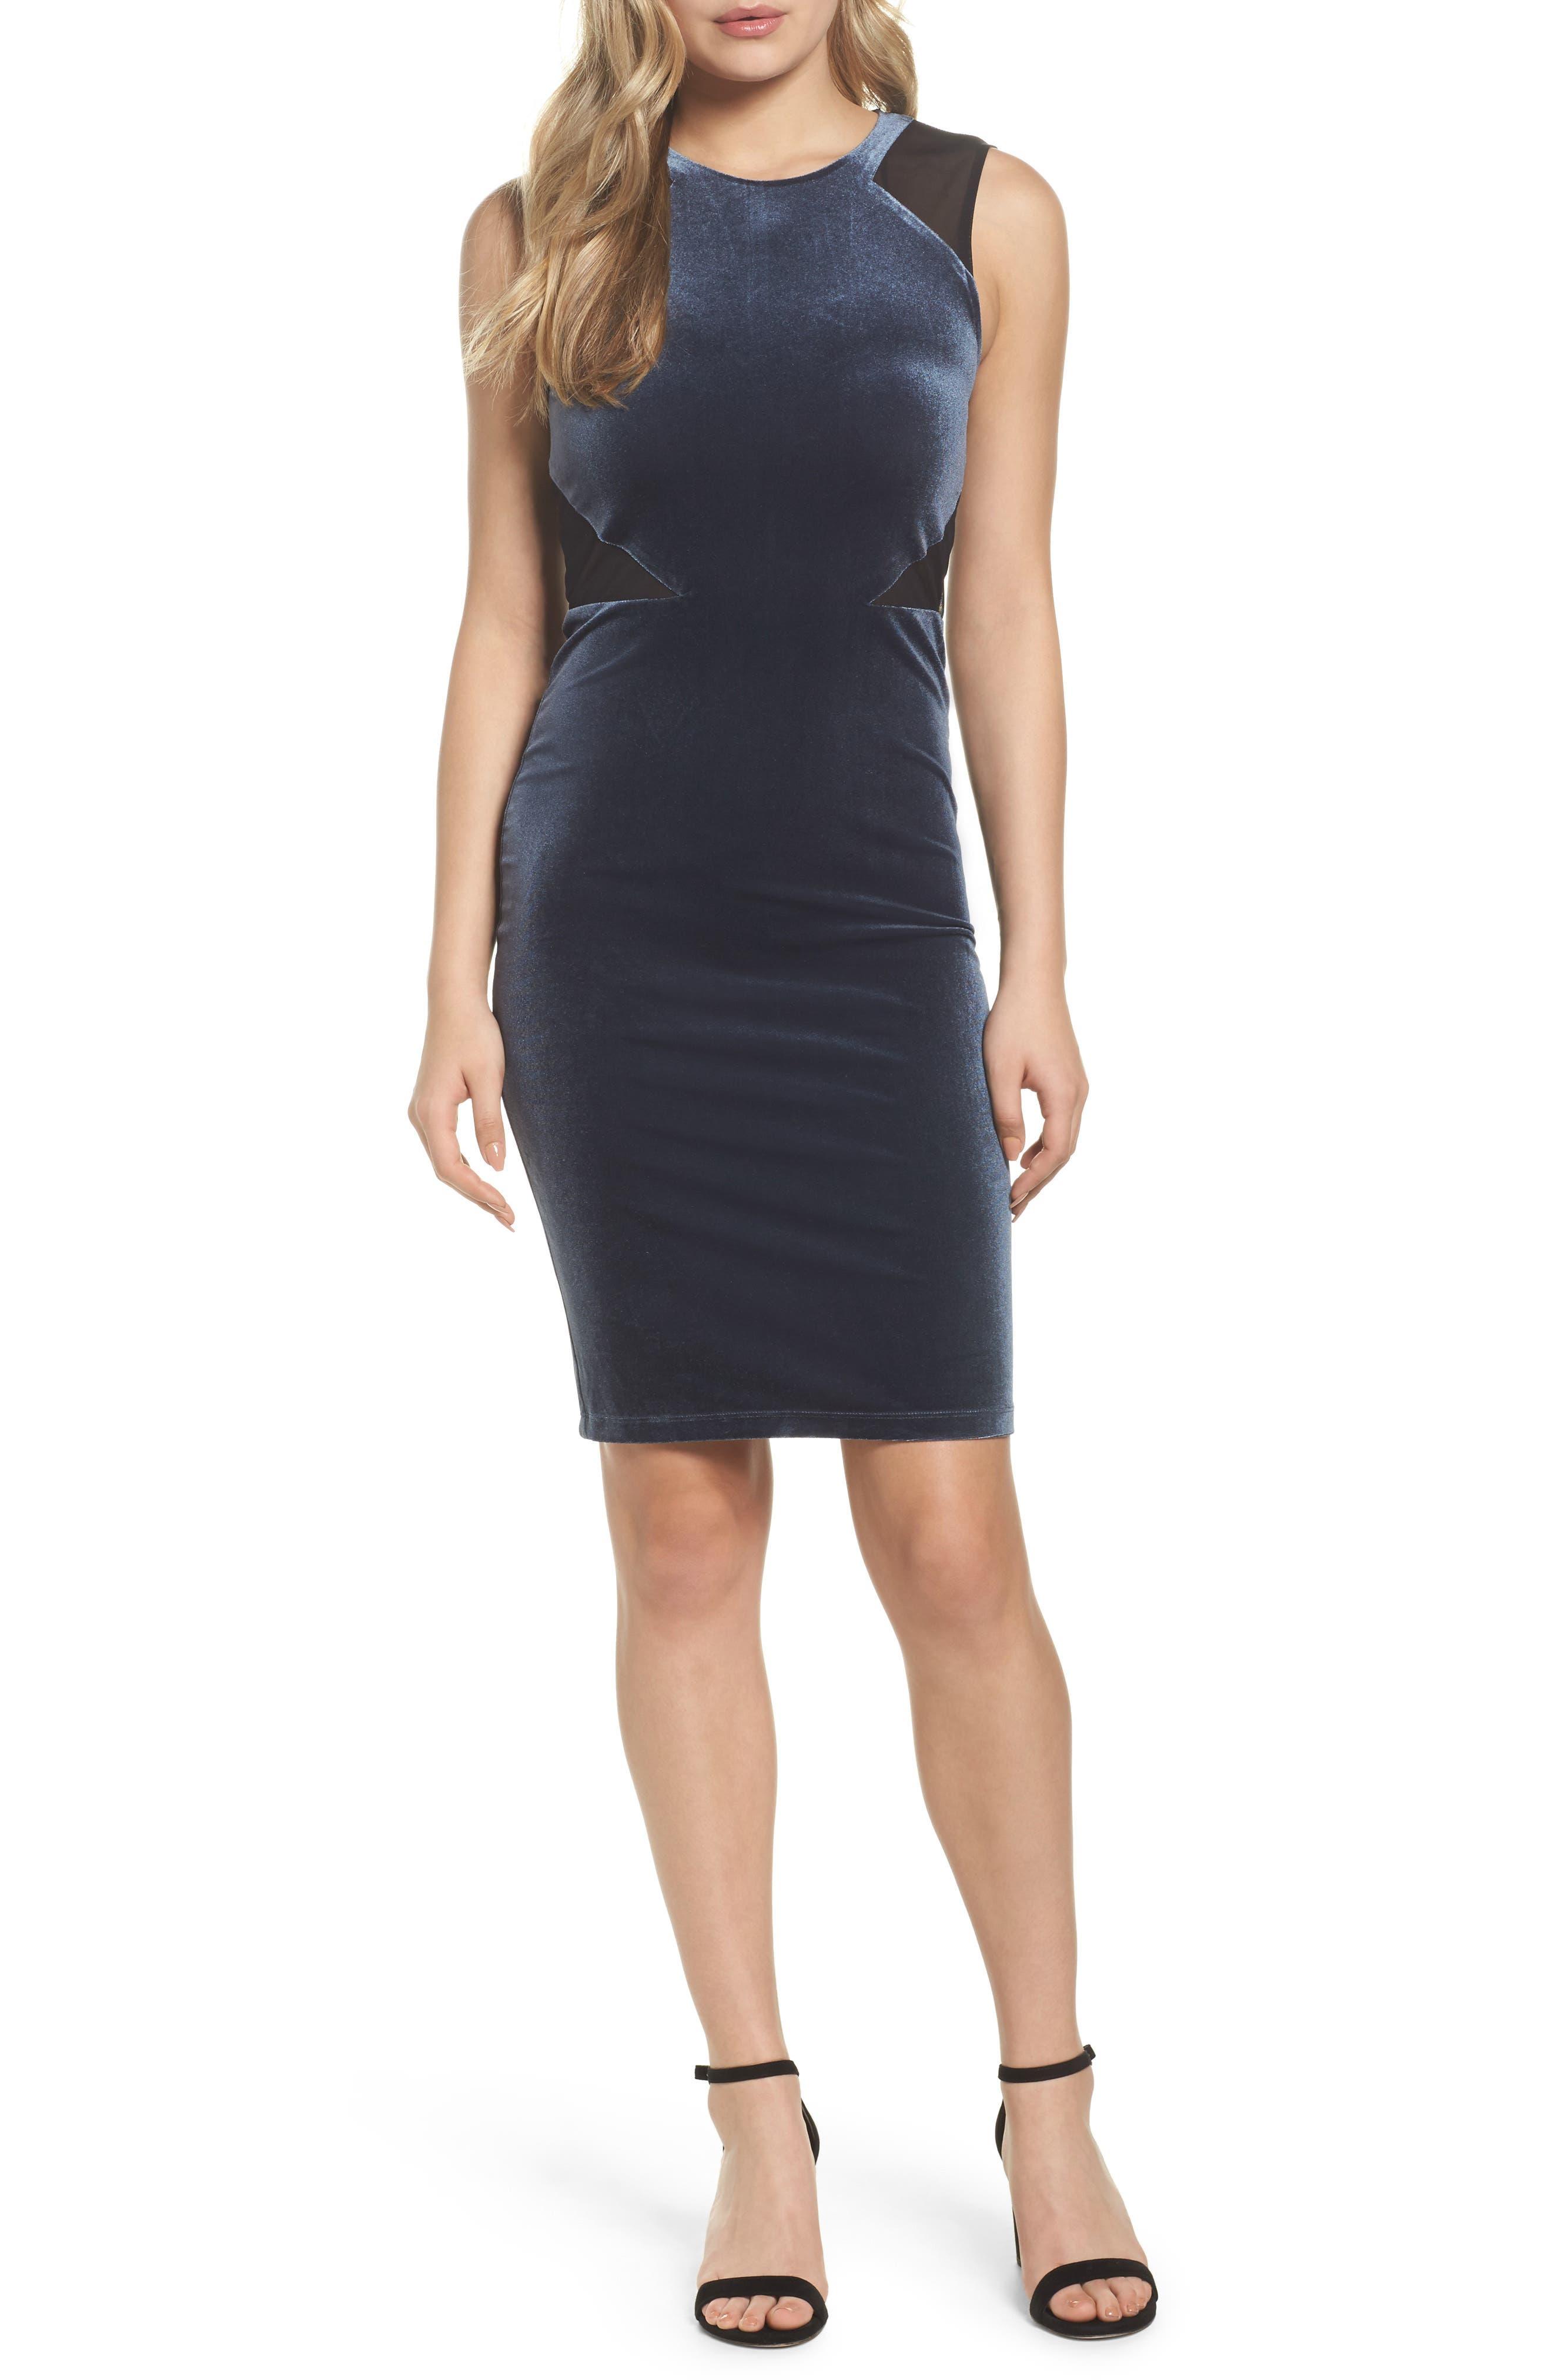 French Connection Viven Velvet Body-Con Dress